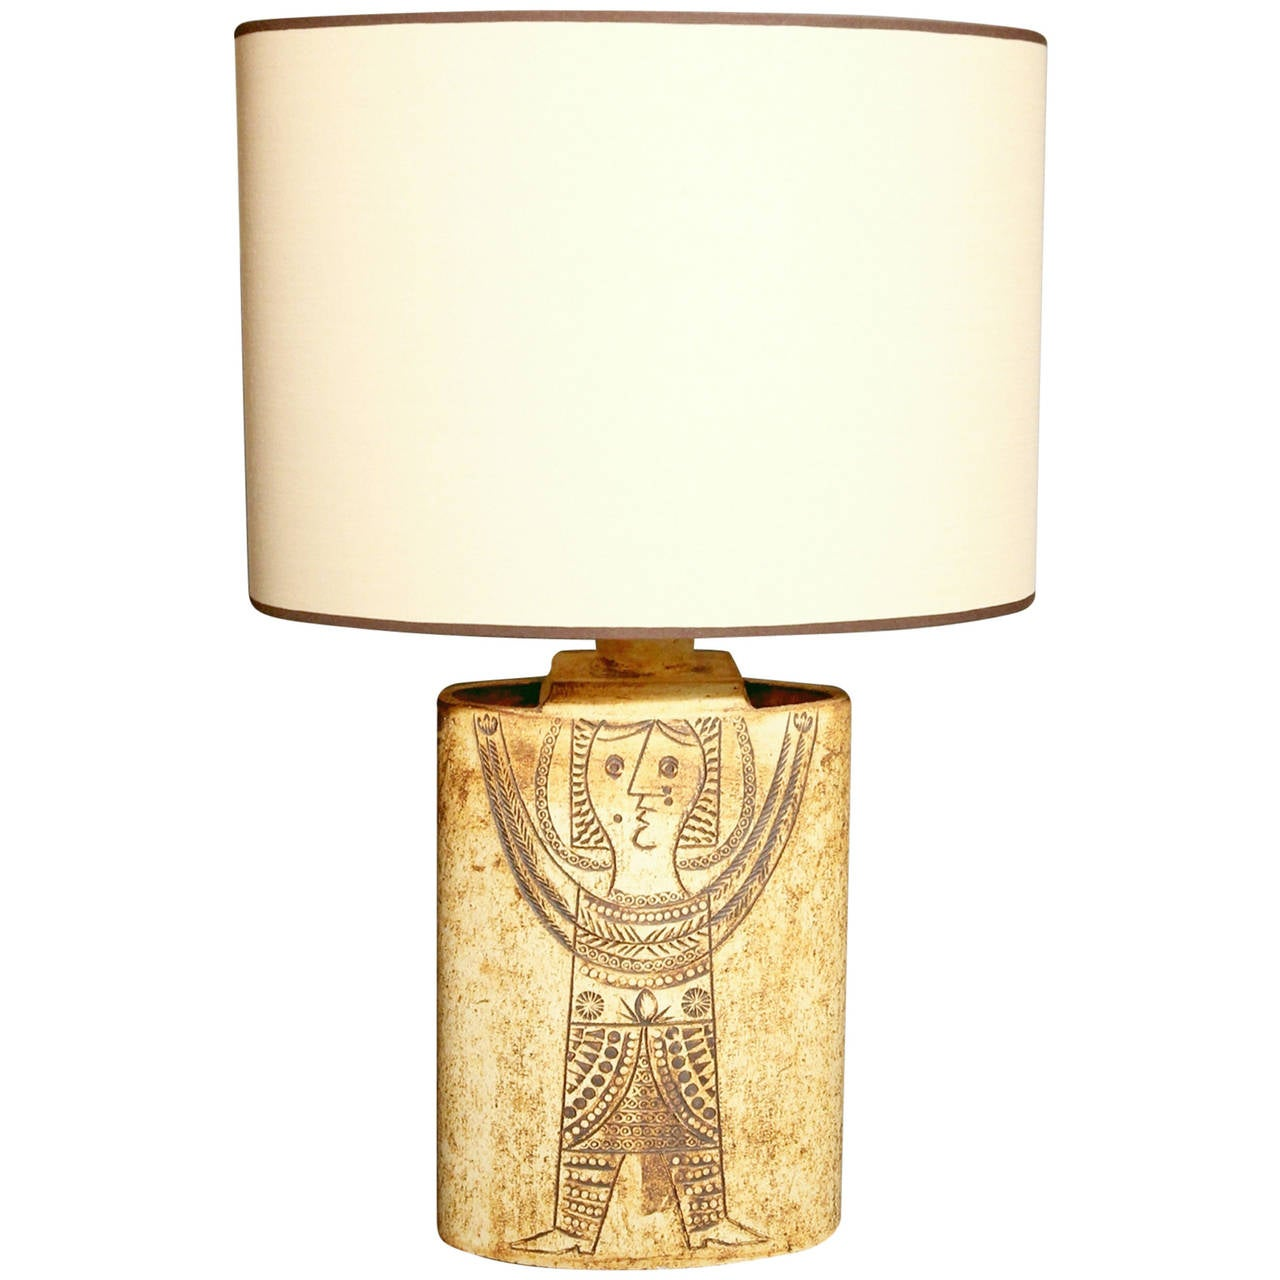 1960s Roger Capron Earthenware Table Lamp